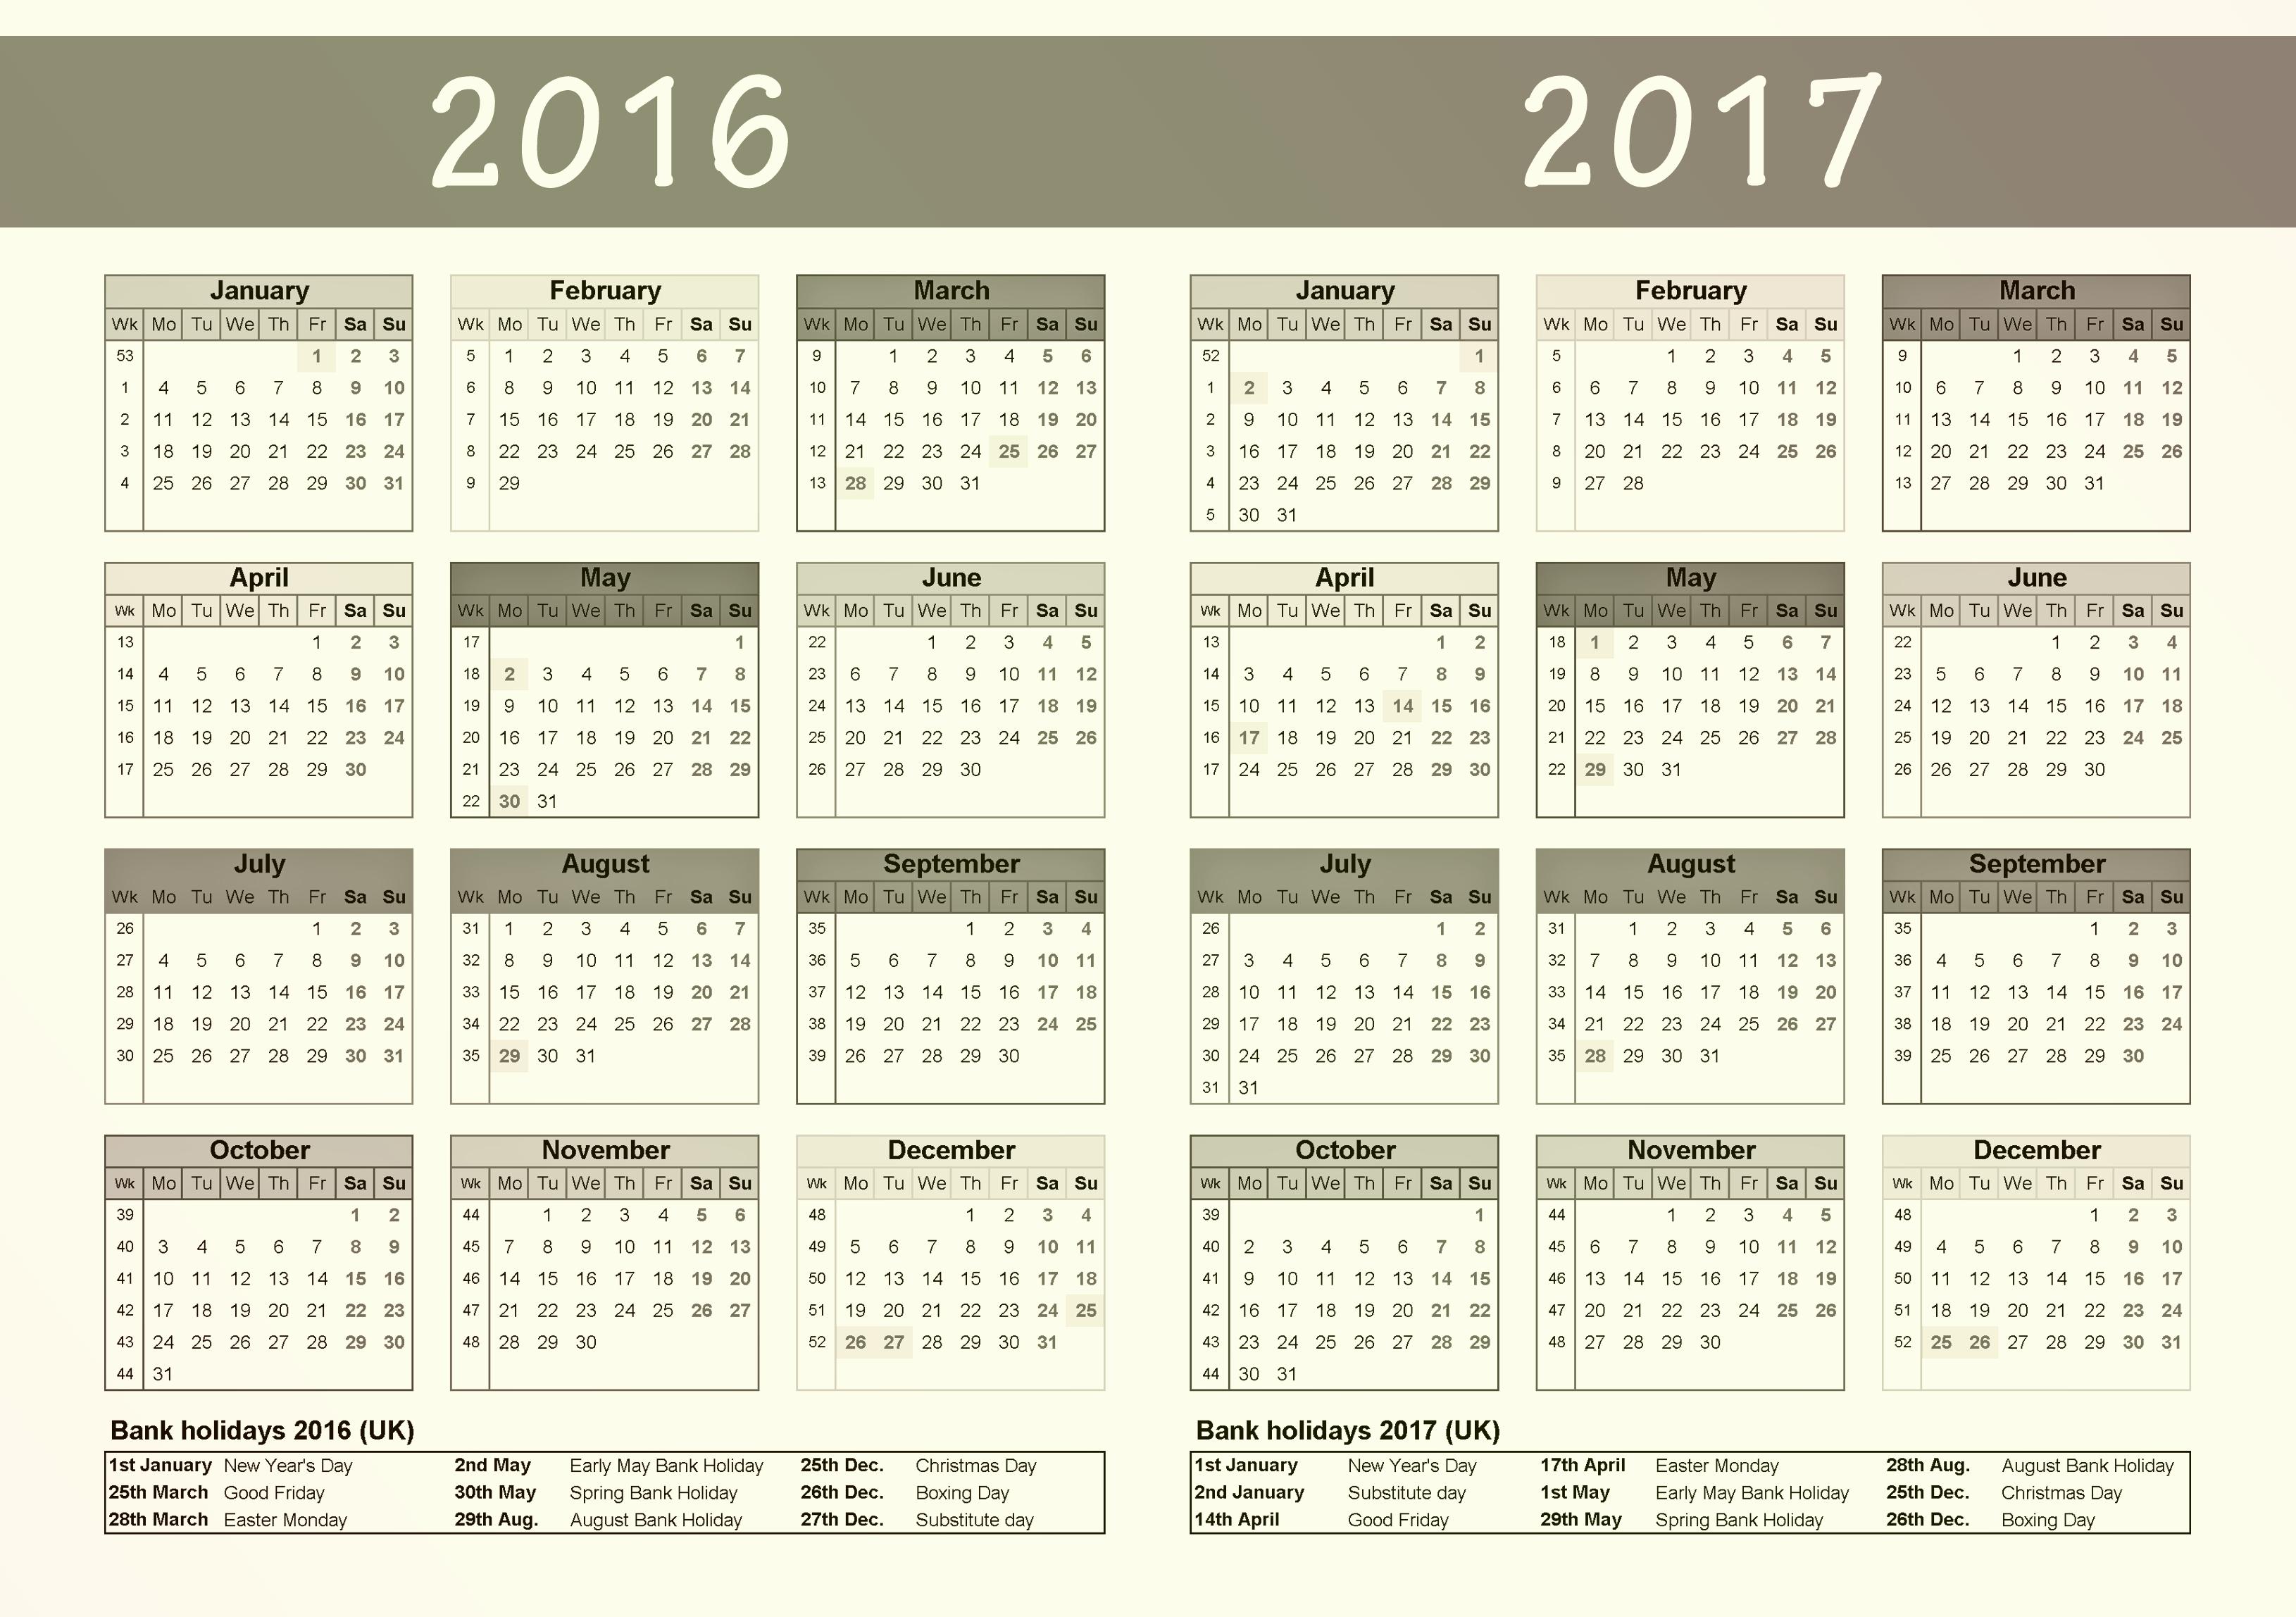 Free Download Of 2017 Calendar Luxury 2016 2017 Calendar